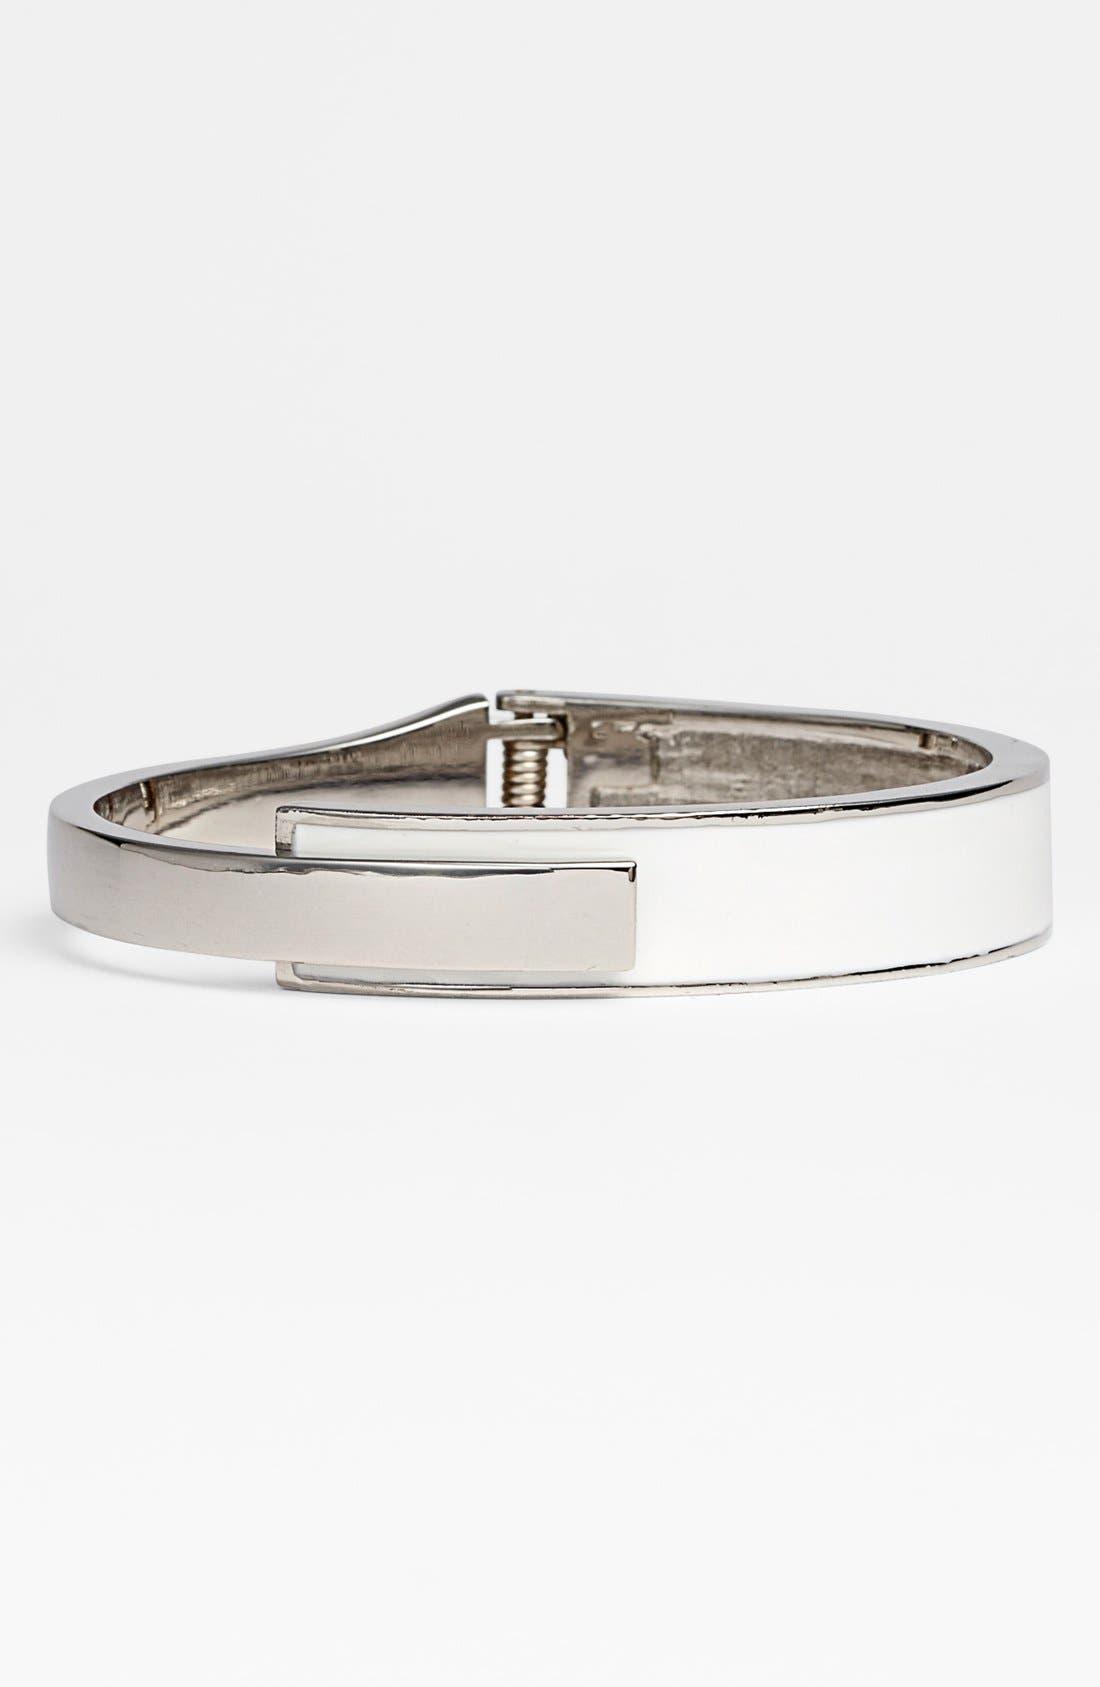 Alternate Image 1 Selected - Vince Camuto Enamel Hinged Bracelet (Nordstrom Exclusive)